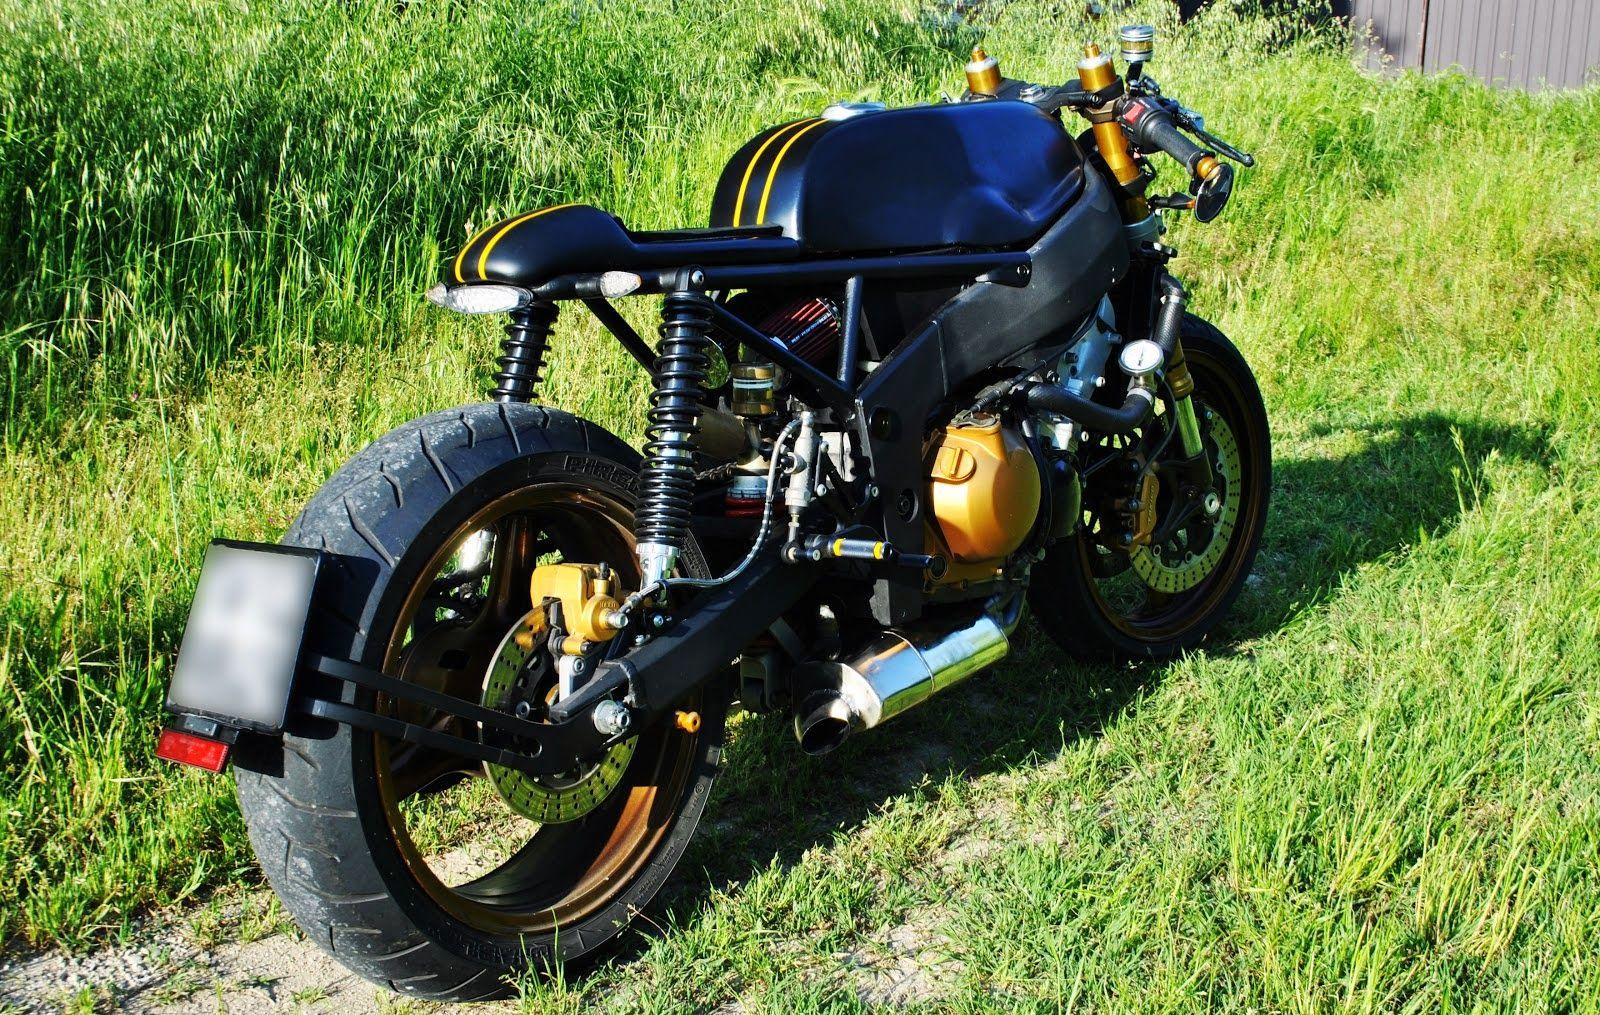 99garage Cafe Racers Customs Passion Inspiration Kawasaki Zx6r